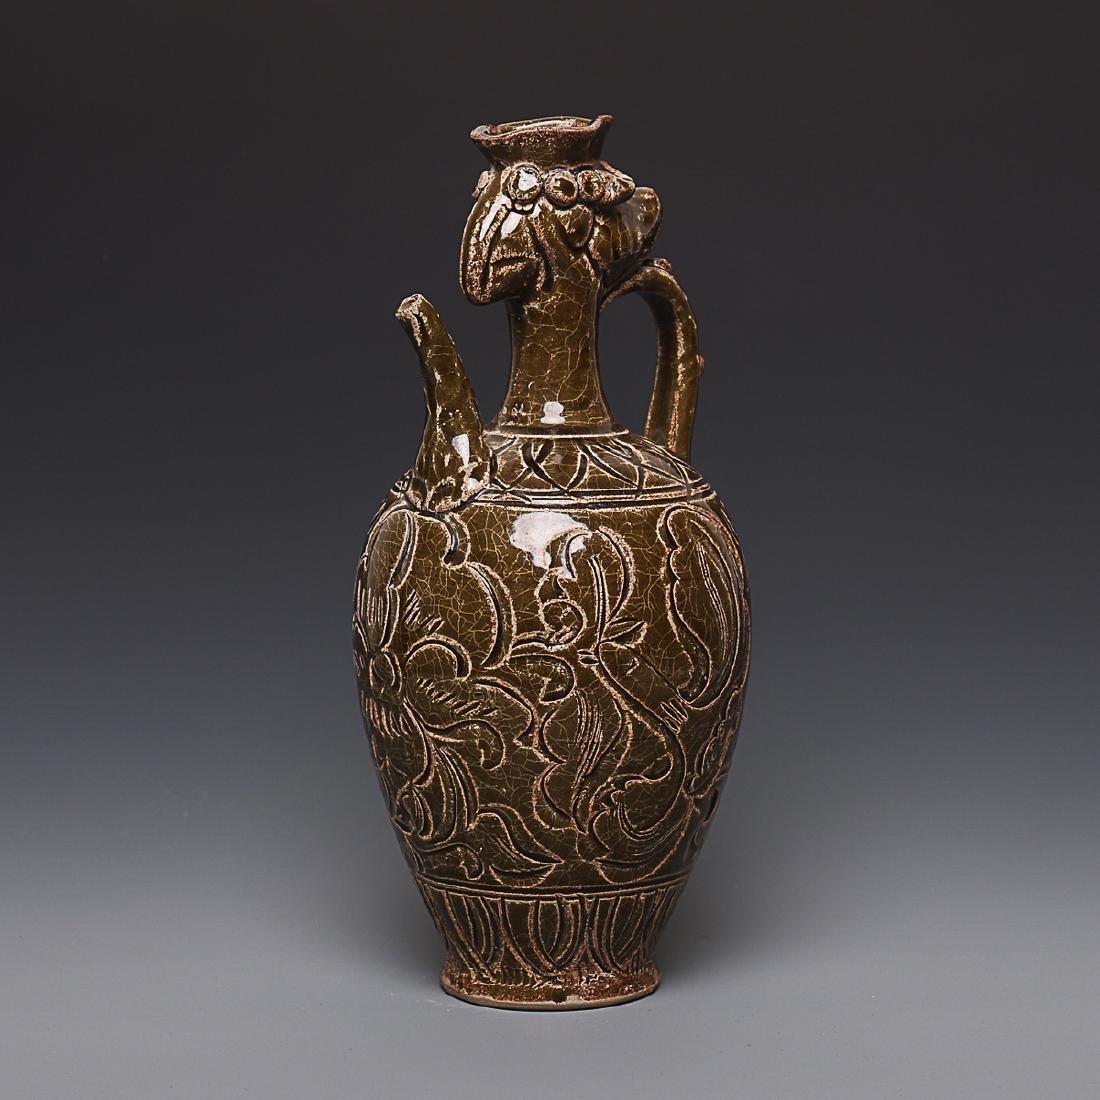 Vintage Chinese Porcelain Pot - 2